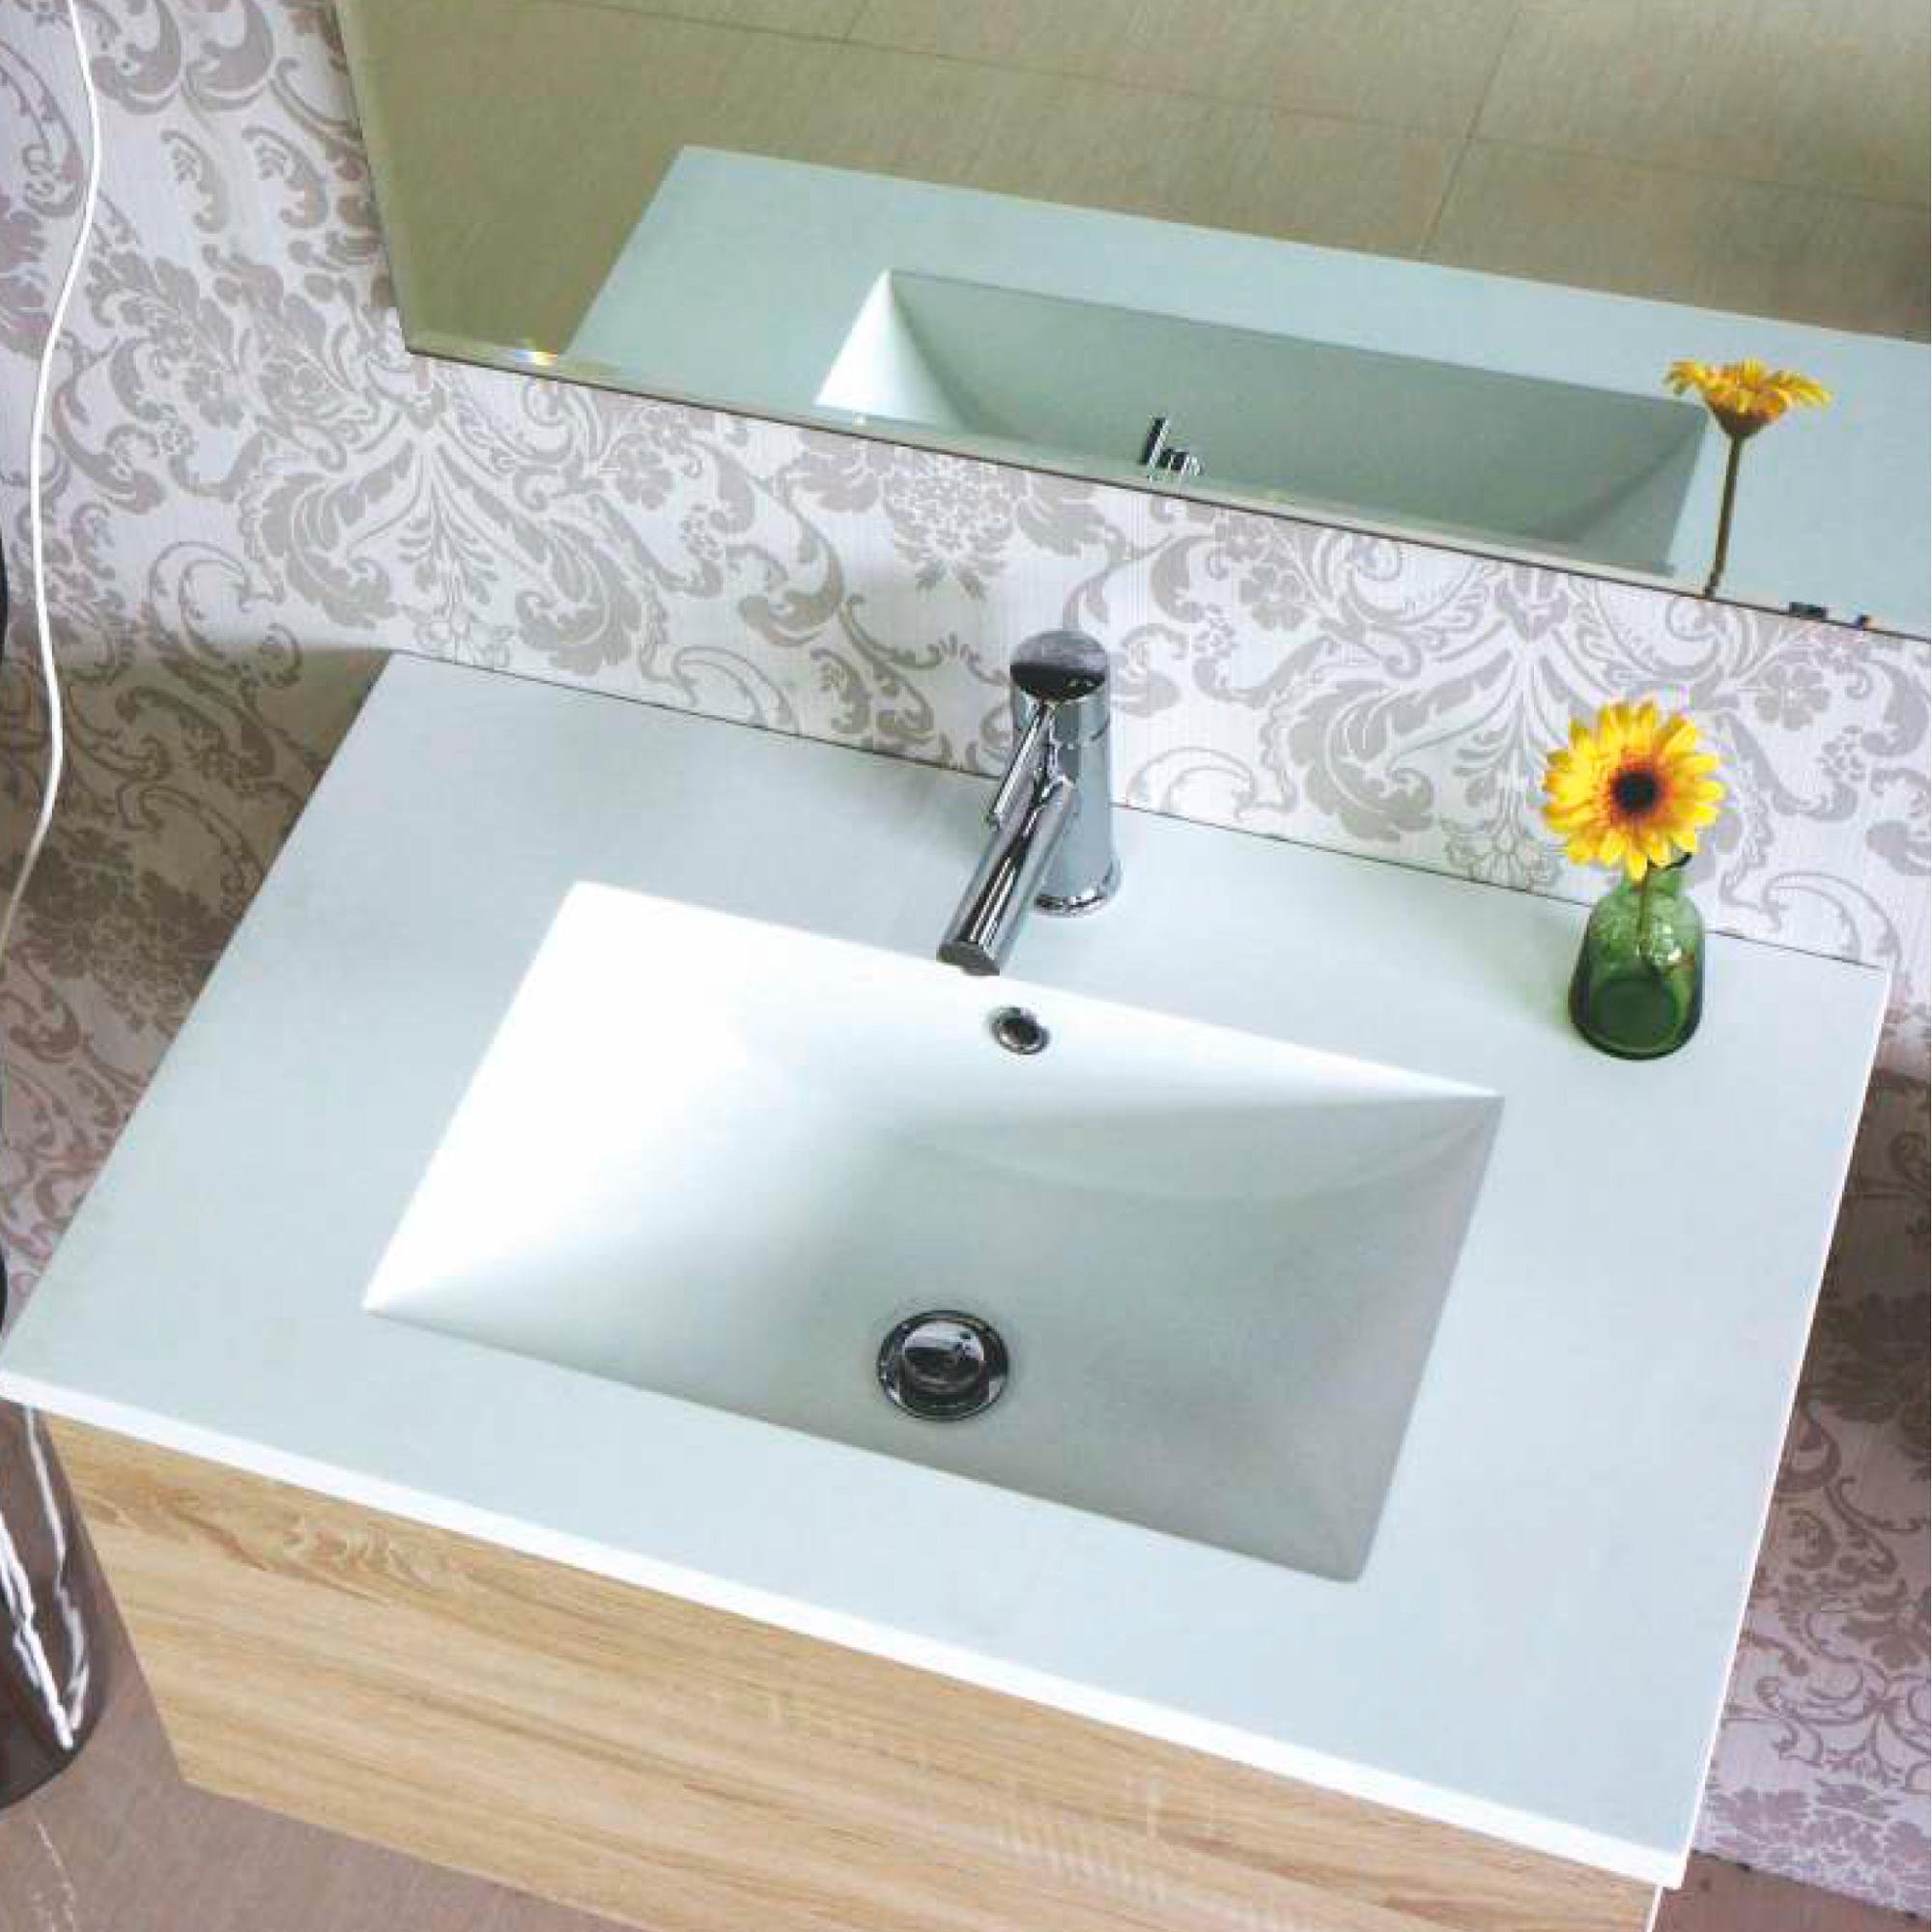 Single Bowl Bathroom Polymarble Vanity Tops For Bathroom Vanity Buy Polymarble Top Bathroom Vanity Top Bathroom Polymarble Vanity Top Product On Alibaba Com